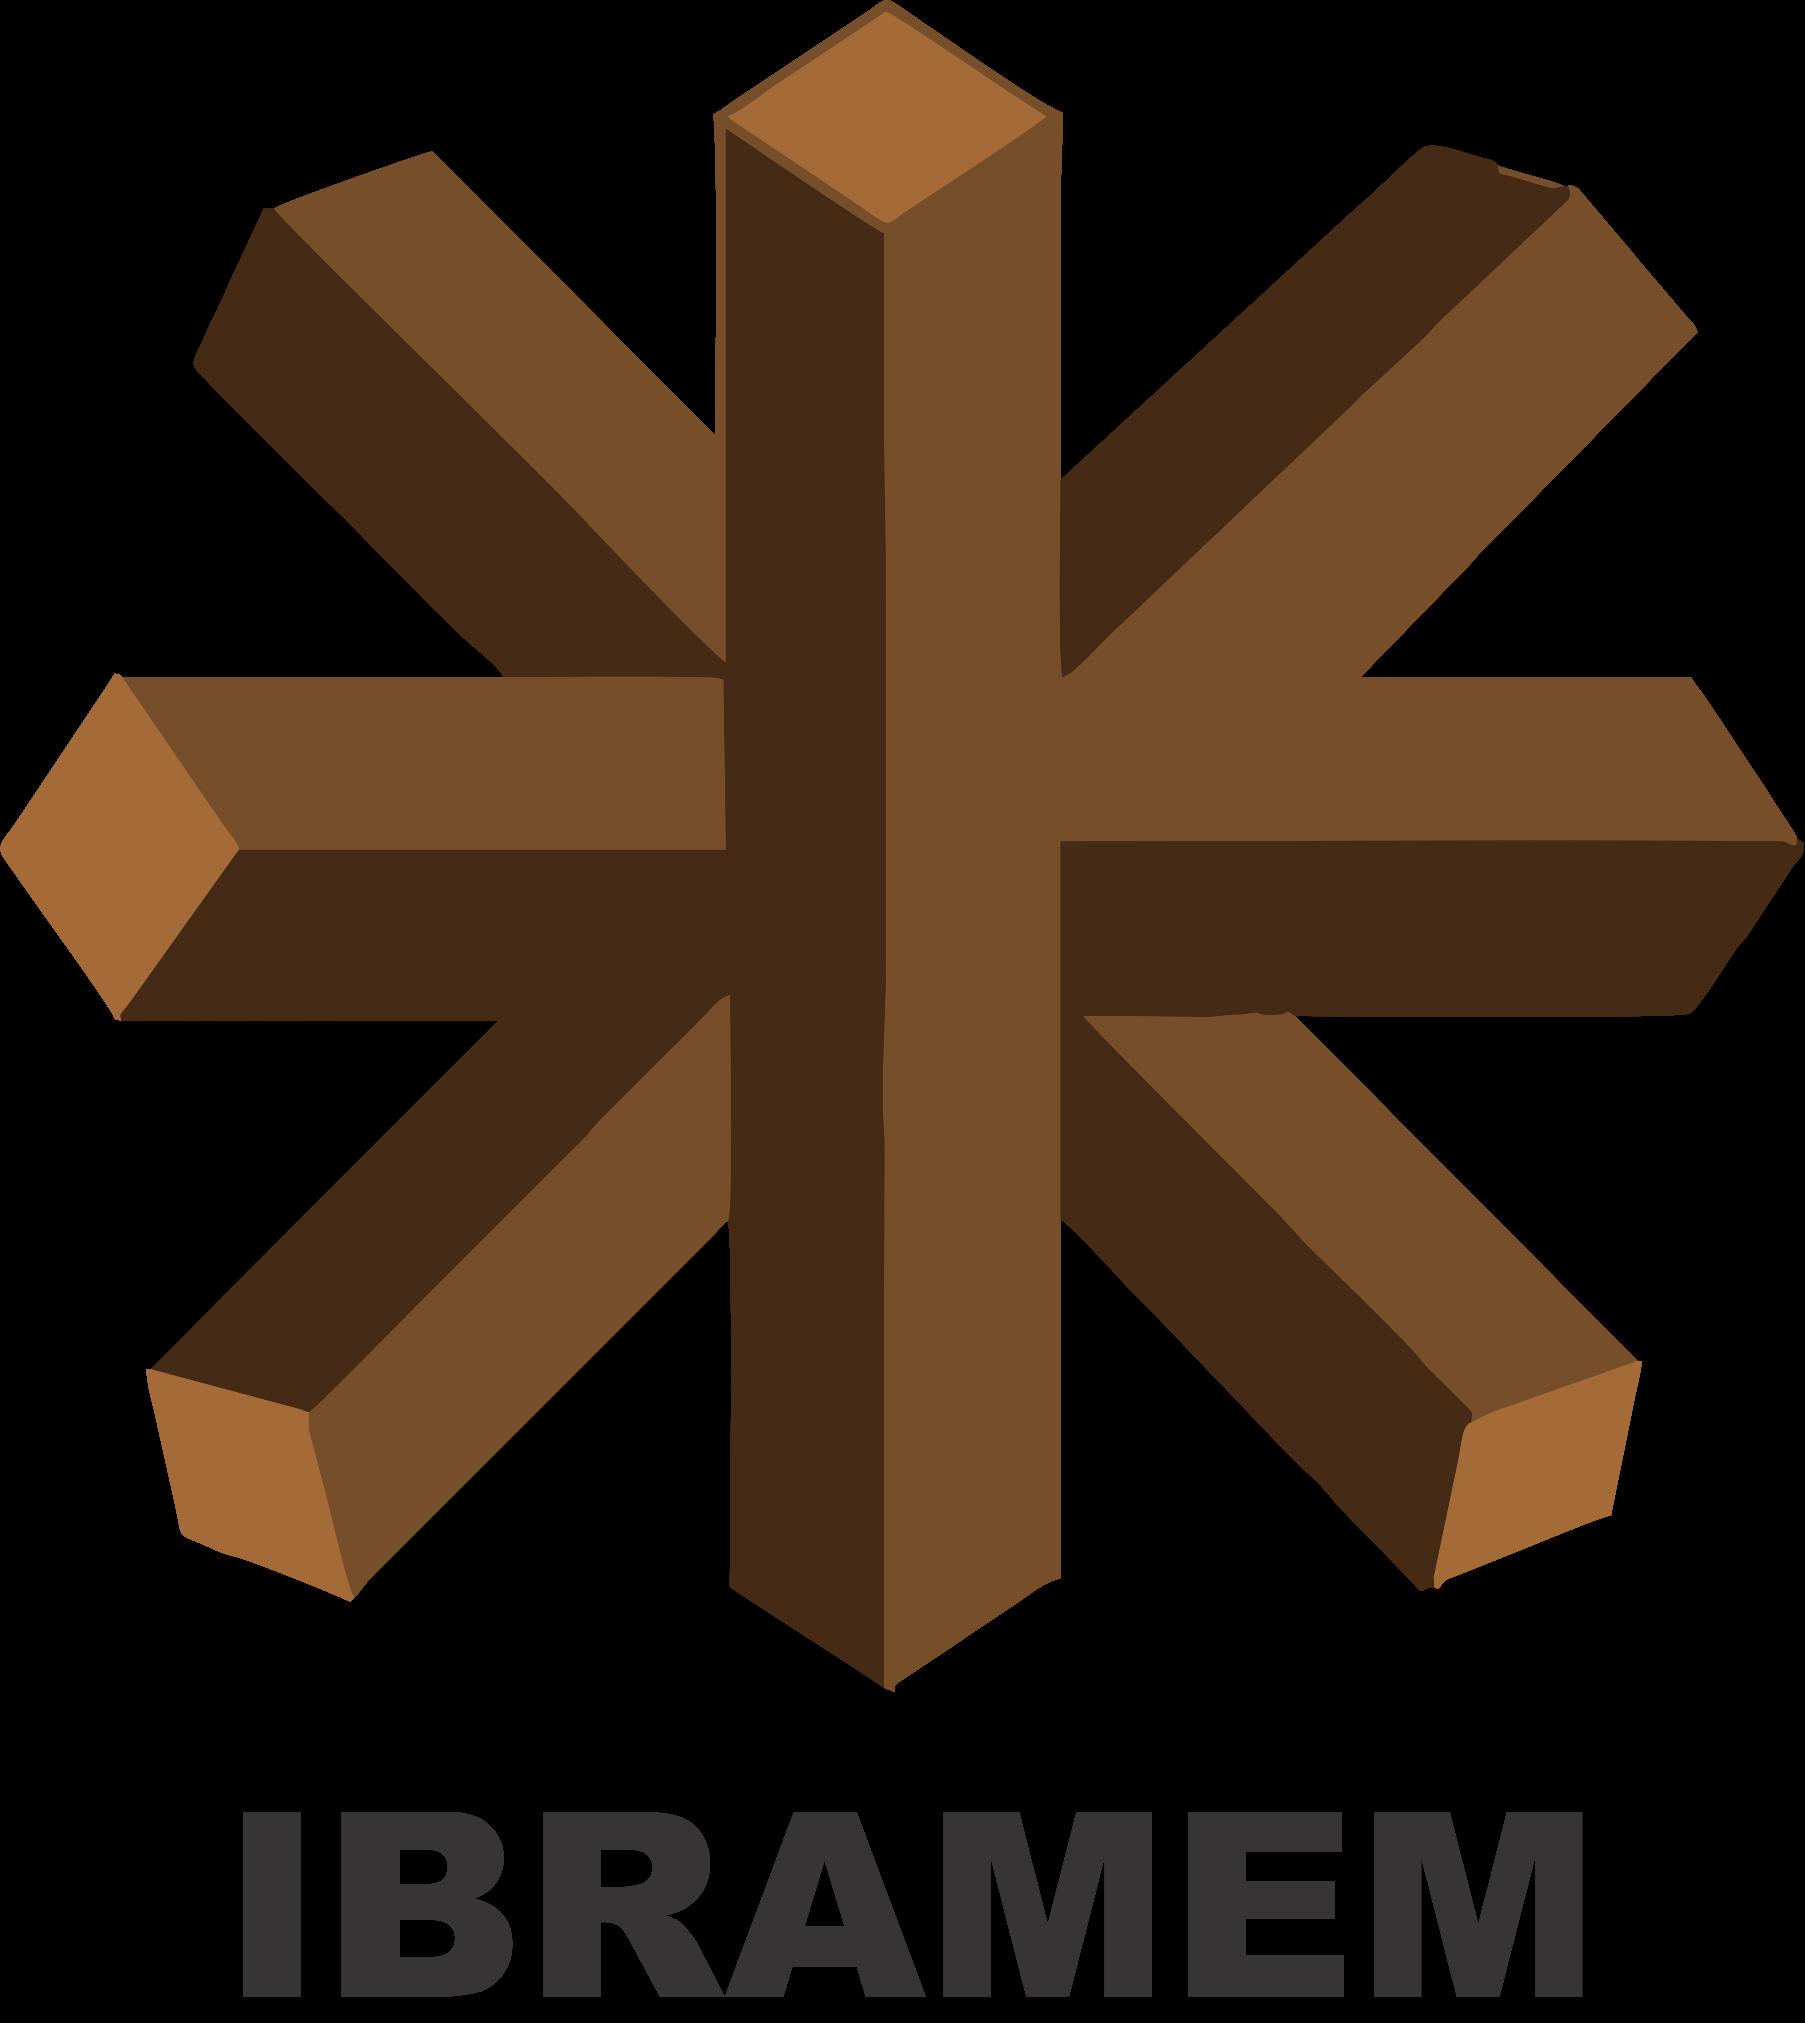 cropped-logo-ibramem-vertical-1805x2105px.png